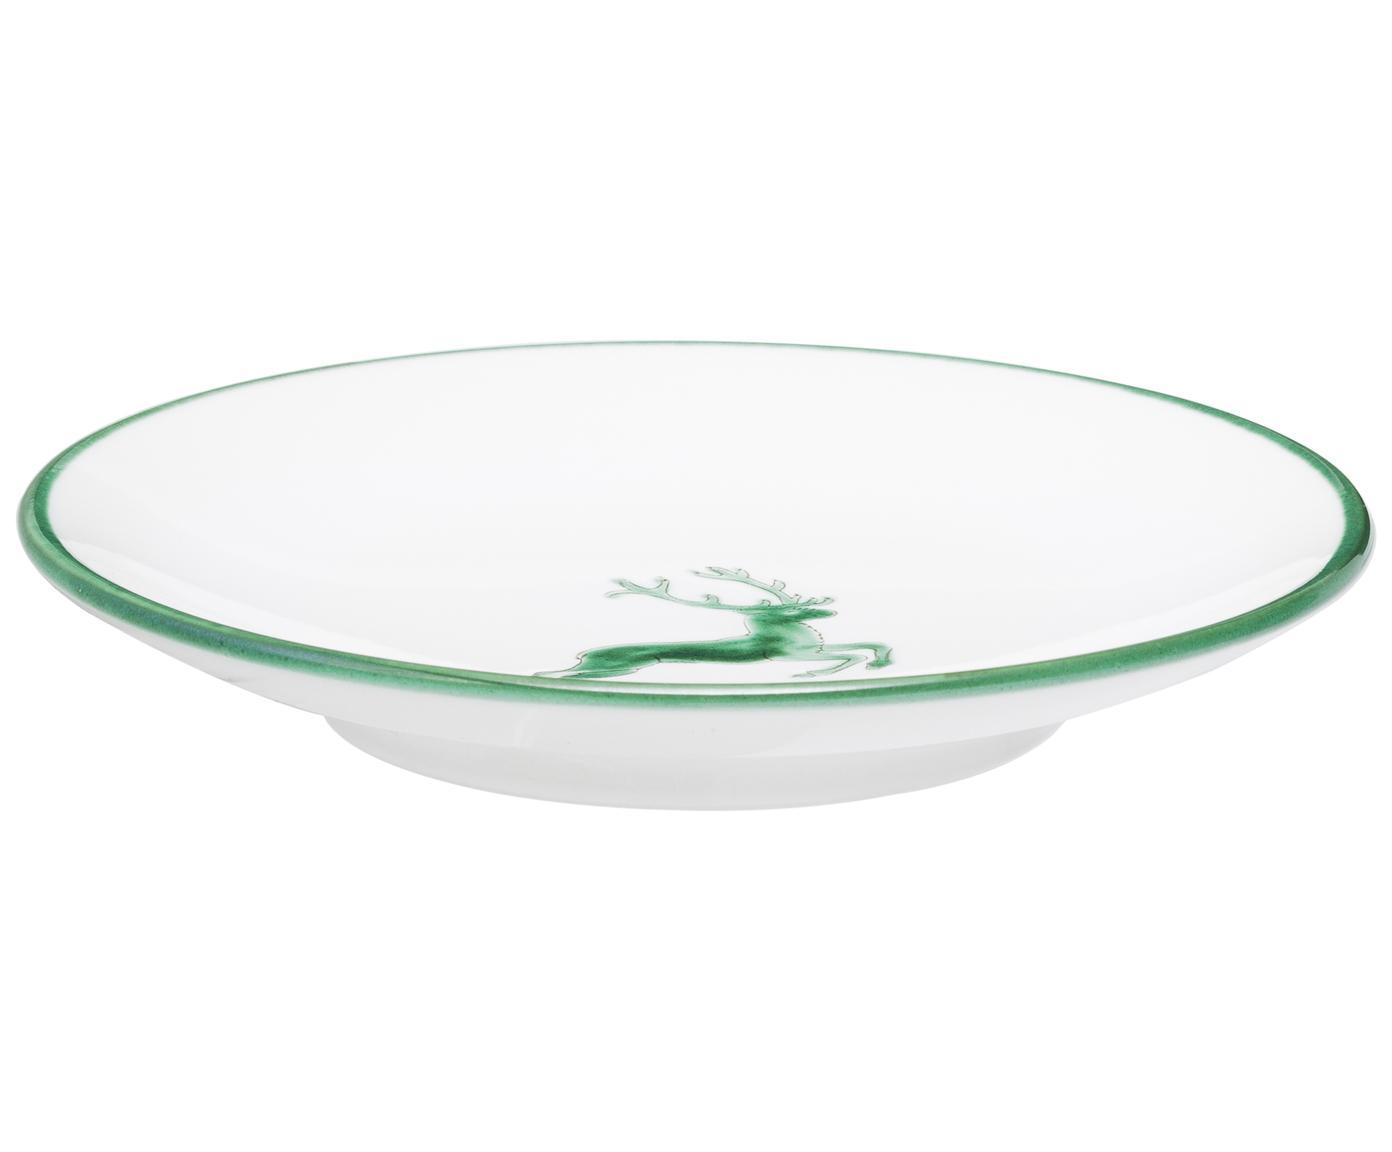 Sottotazza dipinta a mano Classic Grüner Hirsch, Ceramica, Verde, bianco, Ø 15 cm